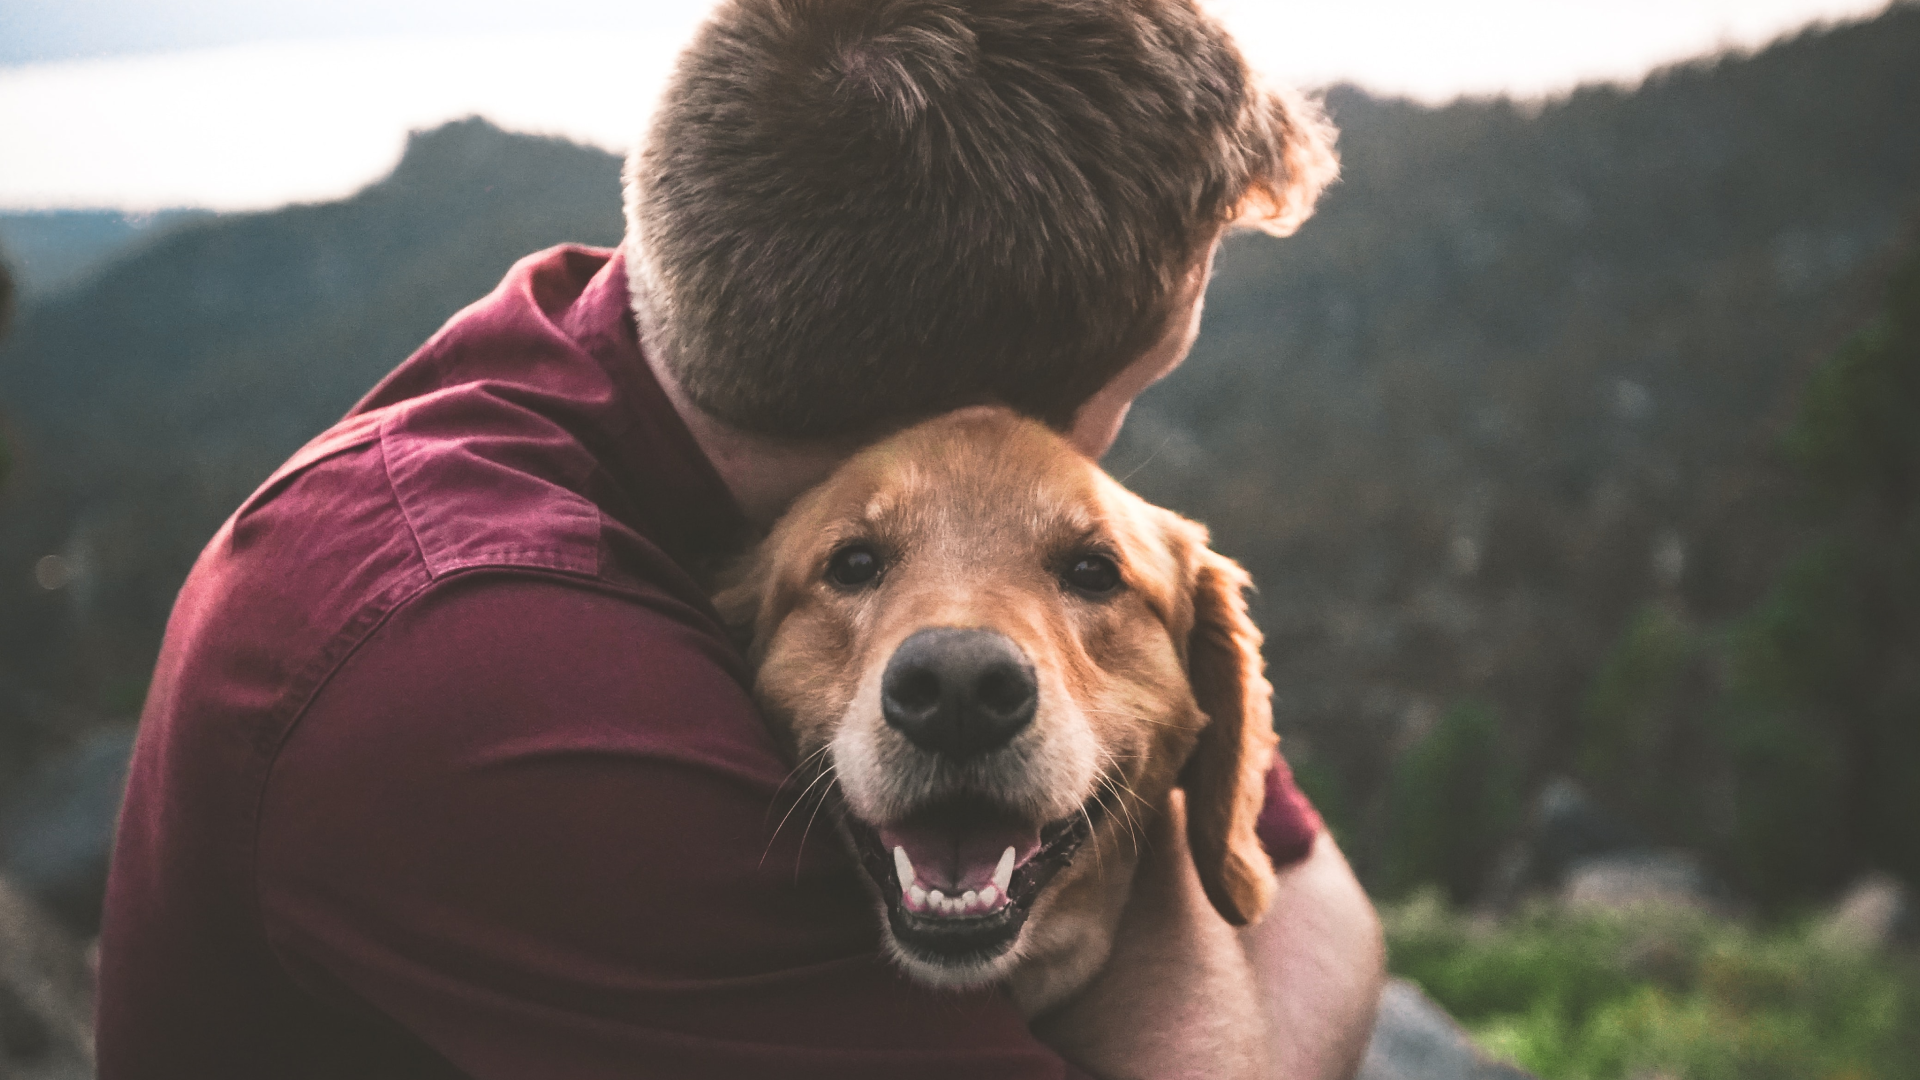 Man hugging esa dog